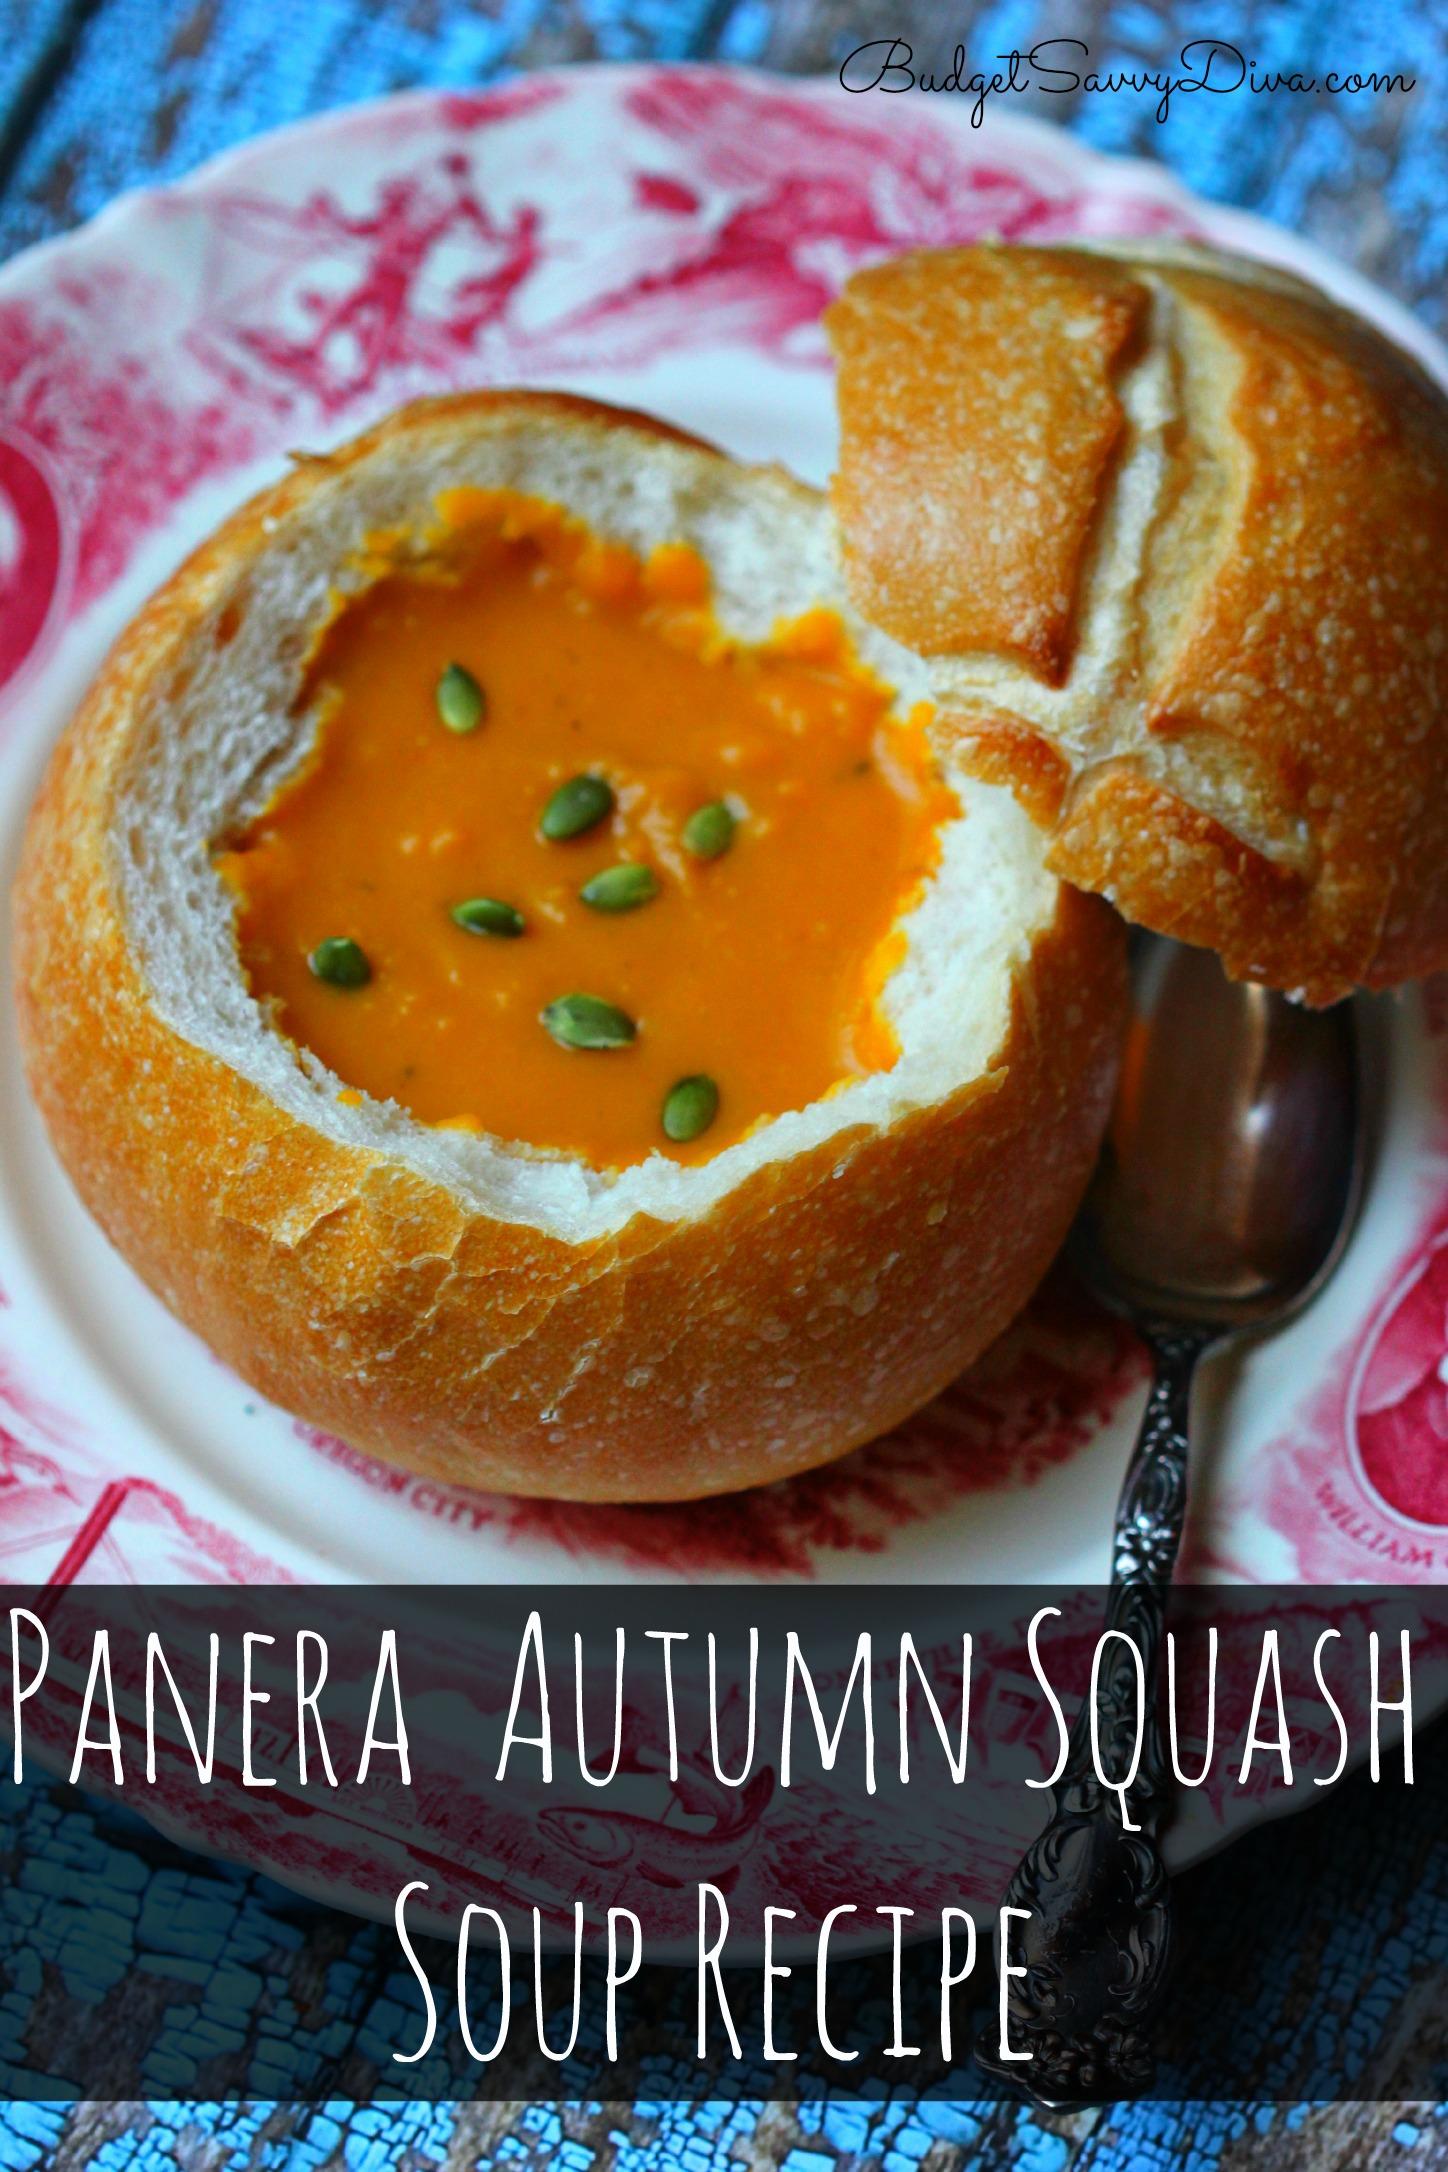 Panera Autumn Squash Soup Recipe  Budget Savvy Diva